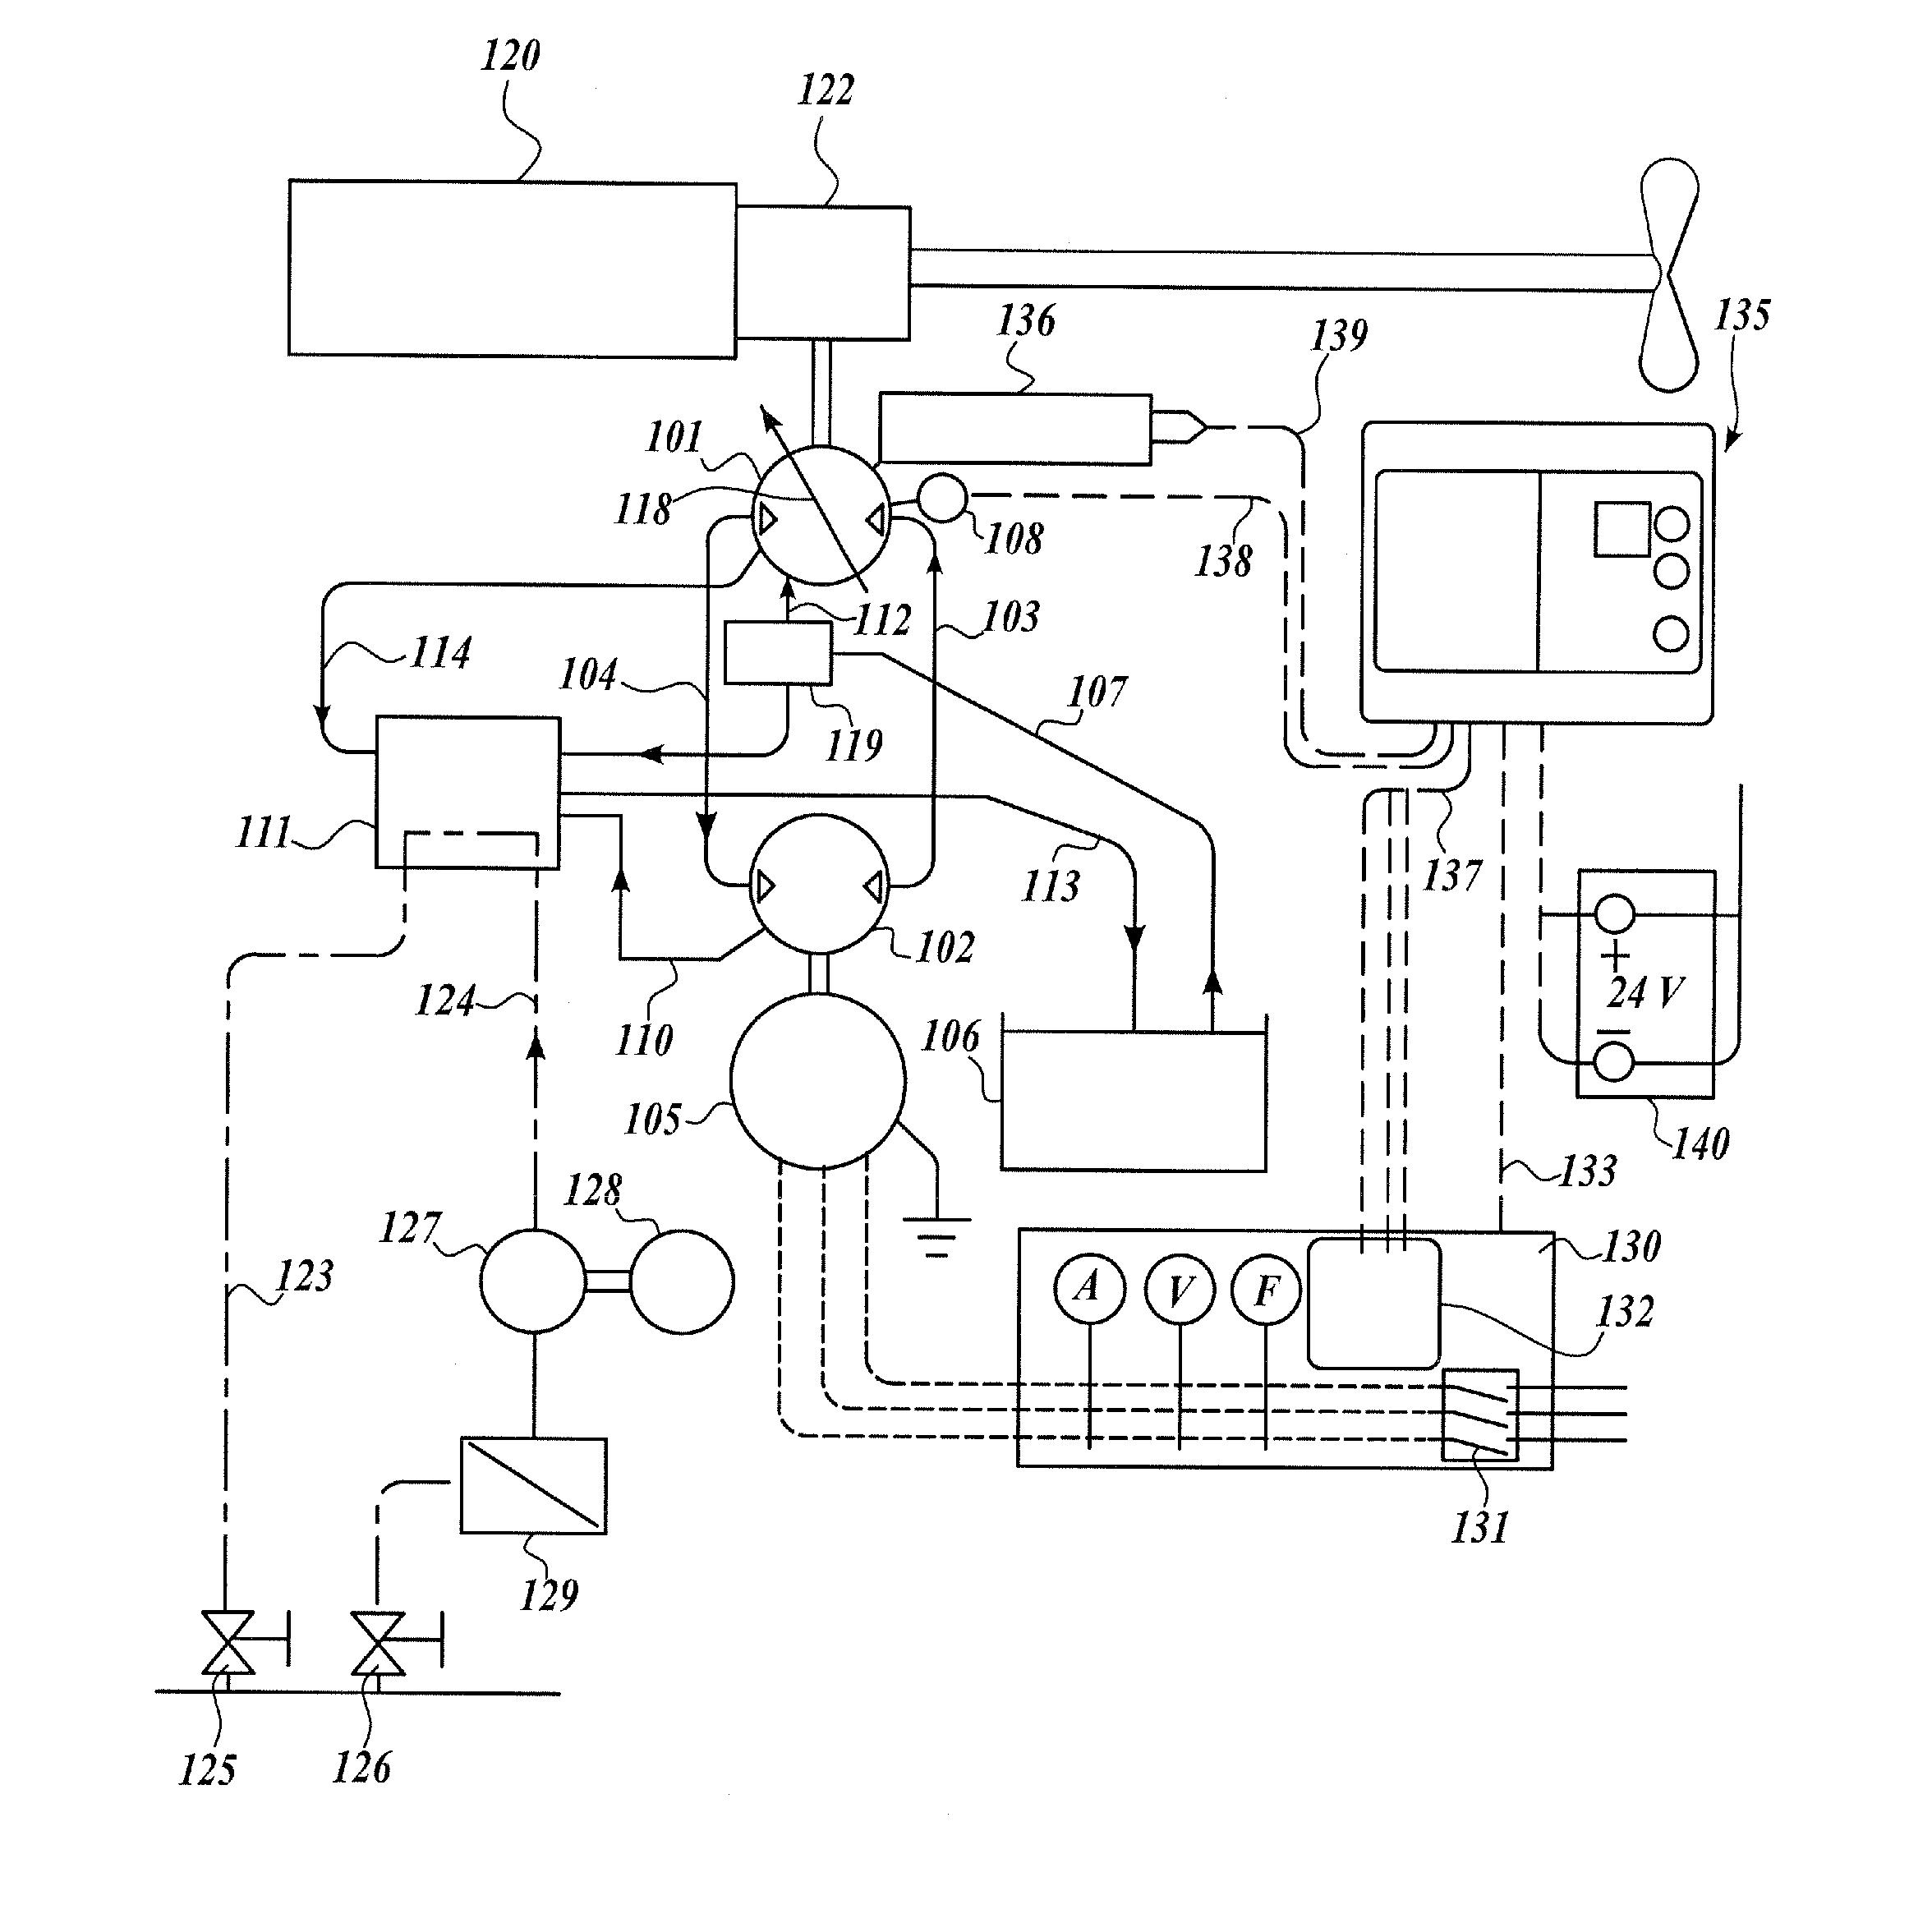 Submersible Pump Control Panel Wiring Diagram